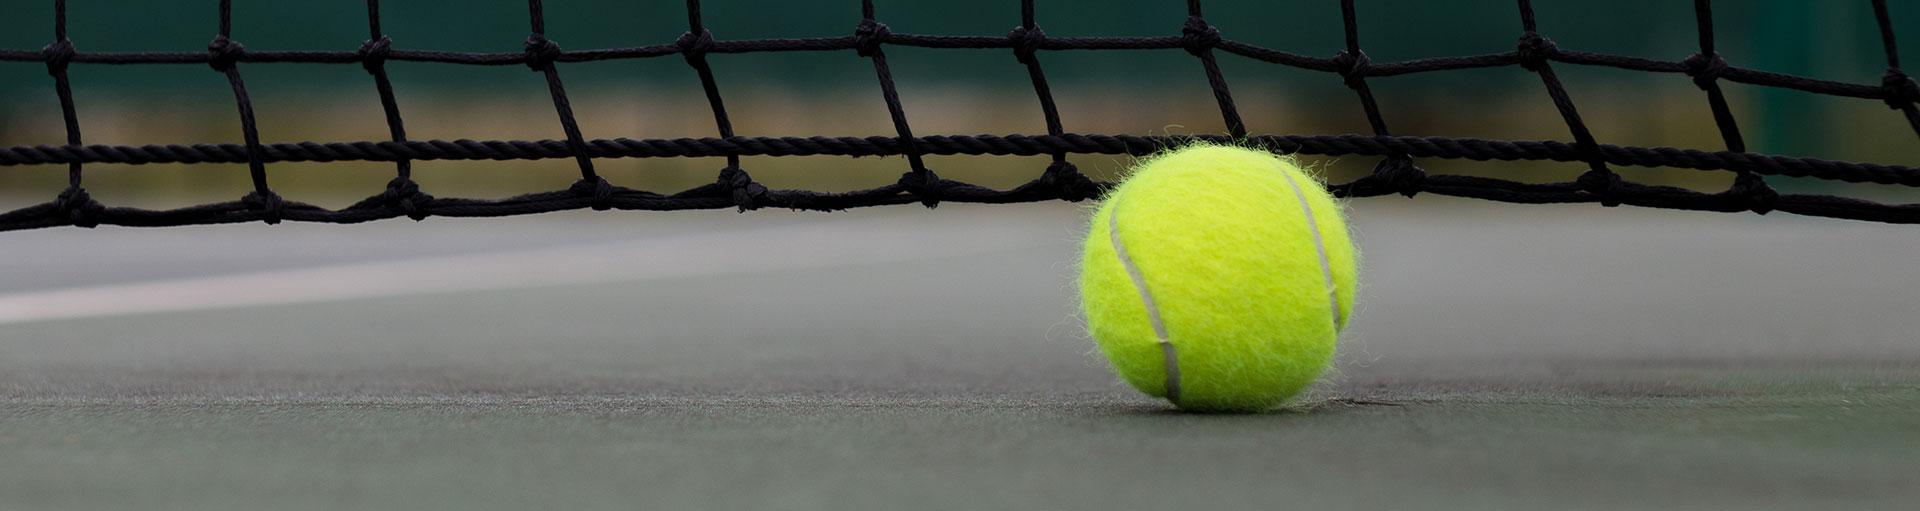 Indoor Tennis Banner Saw Creek Estates